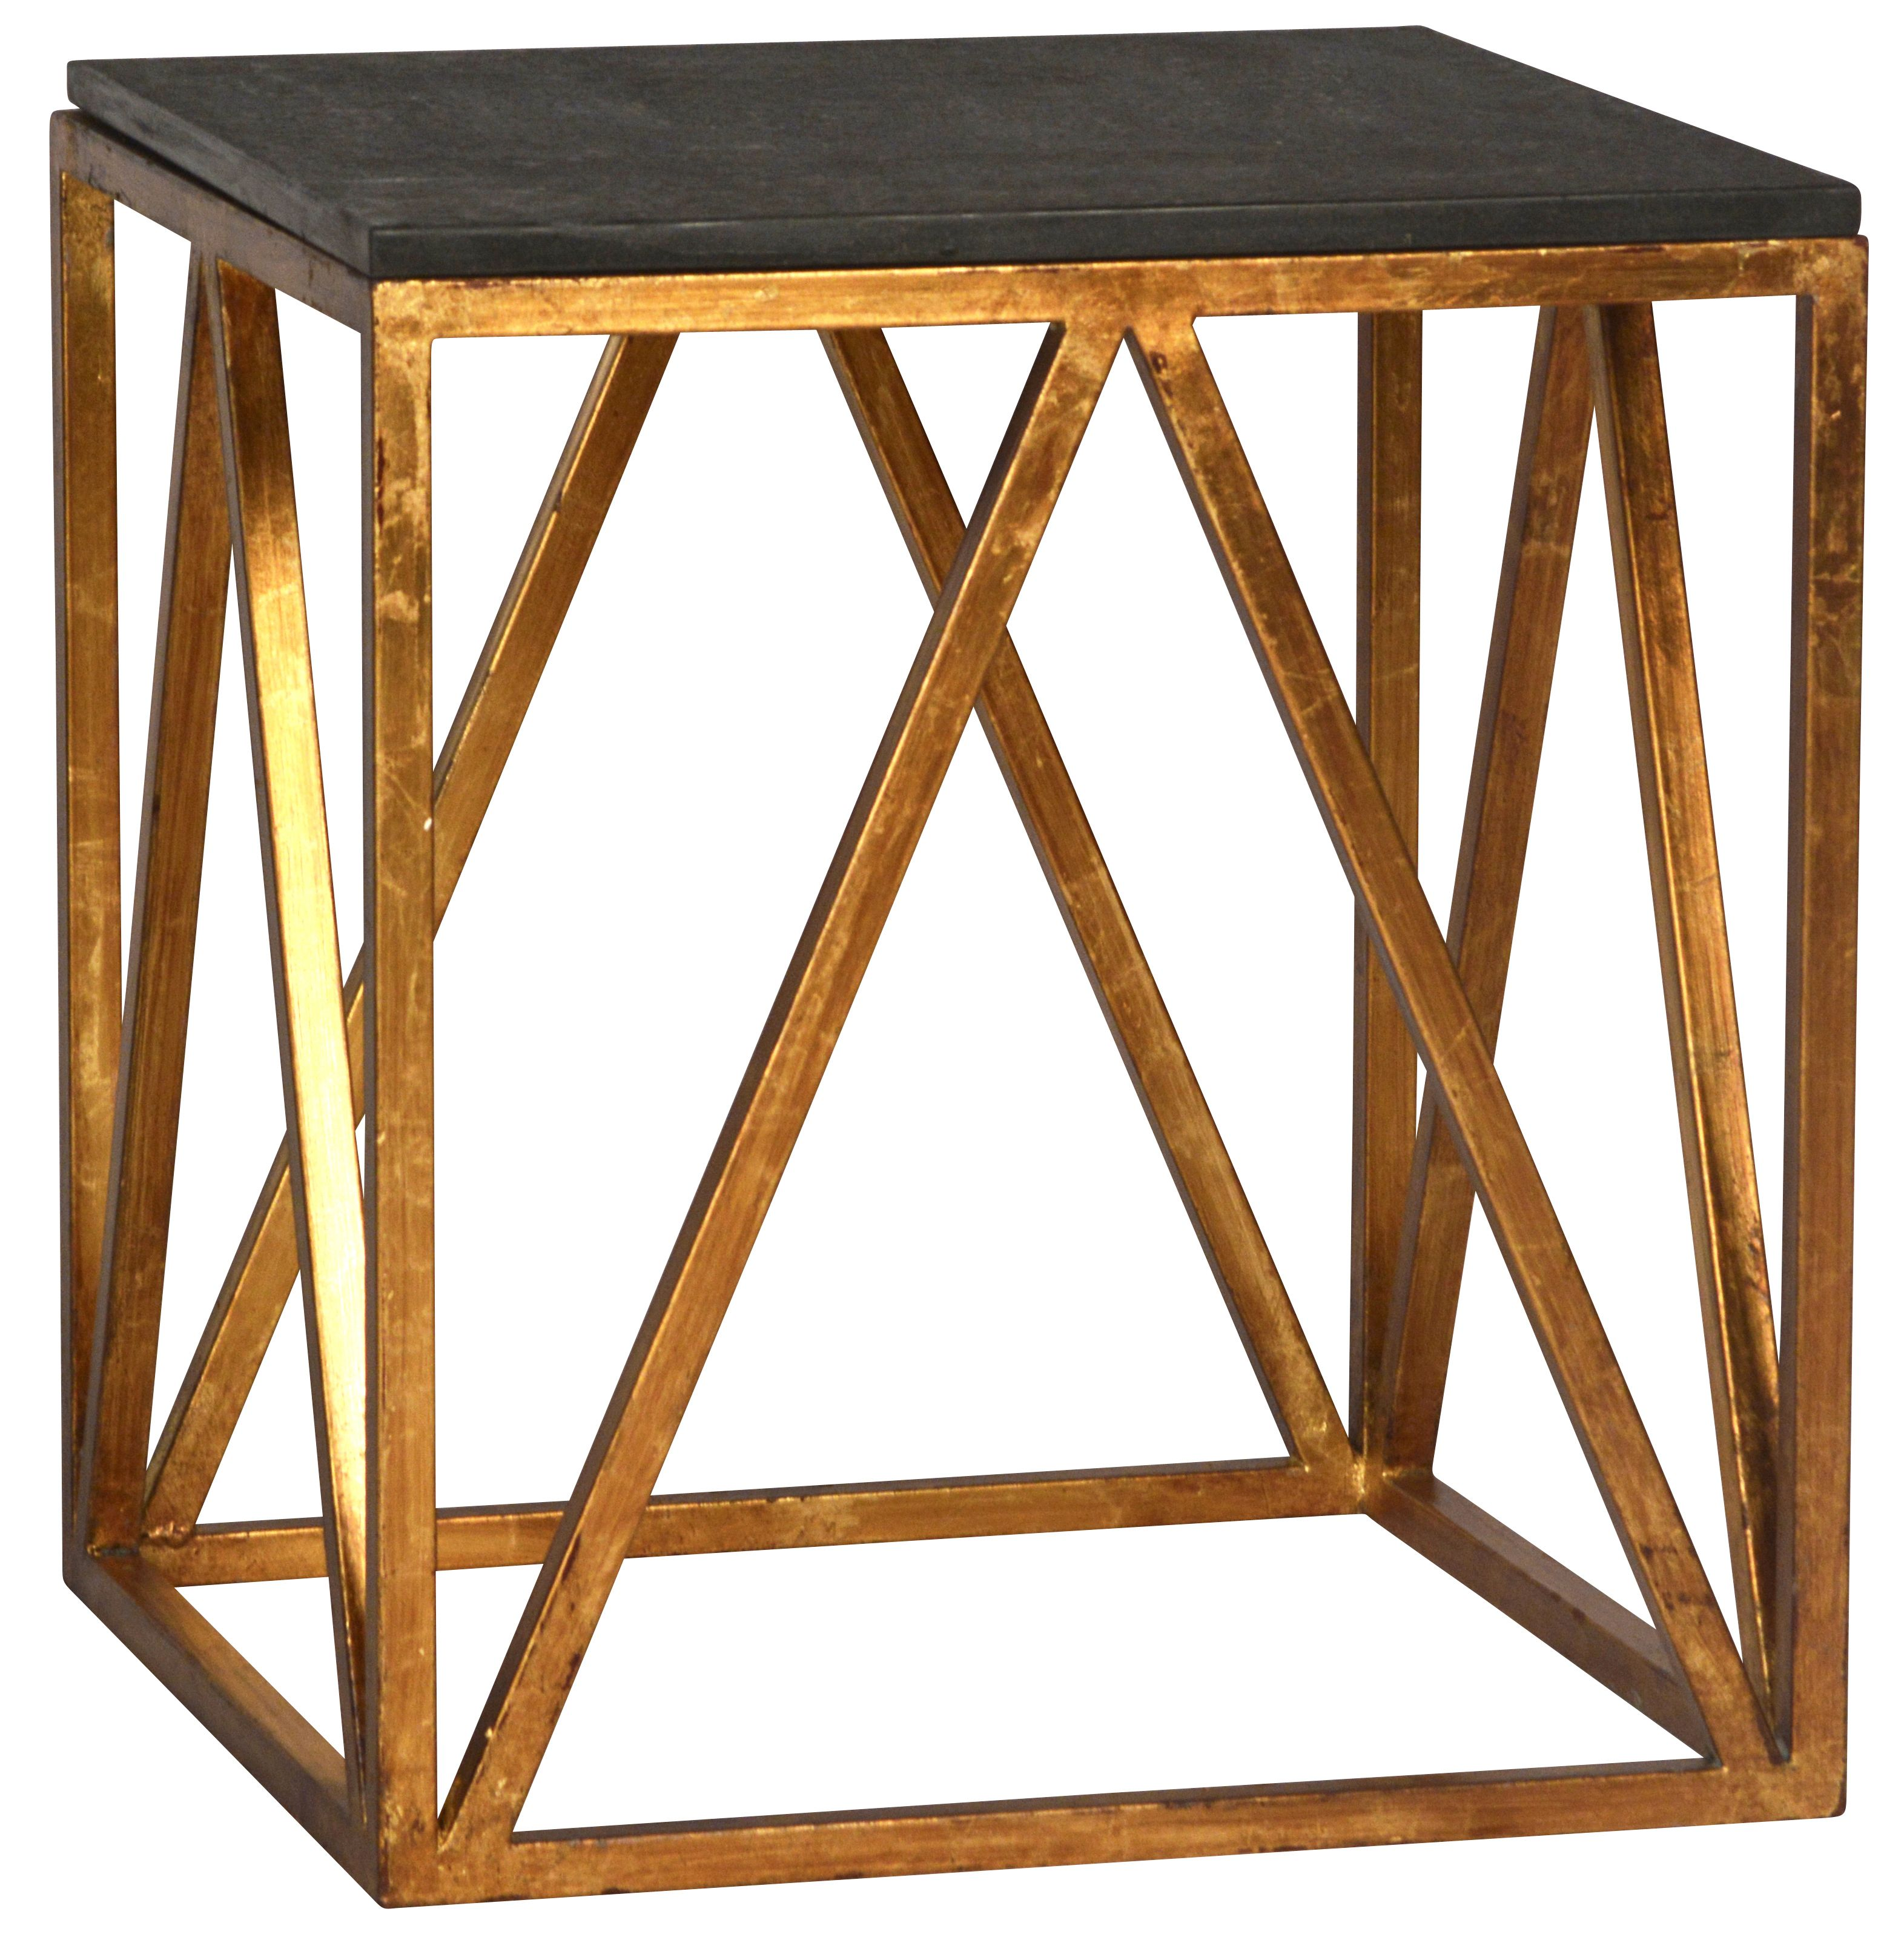 Charmant Dovetail Furniture U0026 Designs, G 7031, G 7039   Suites At Market Square,  SALON Http://www.dovetailfurnitureonline.com/ #DesignonHPMkt #HPMKT